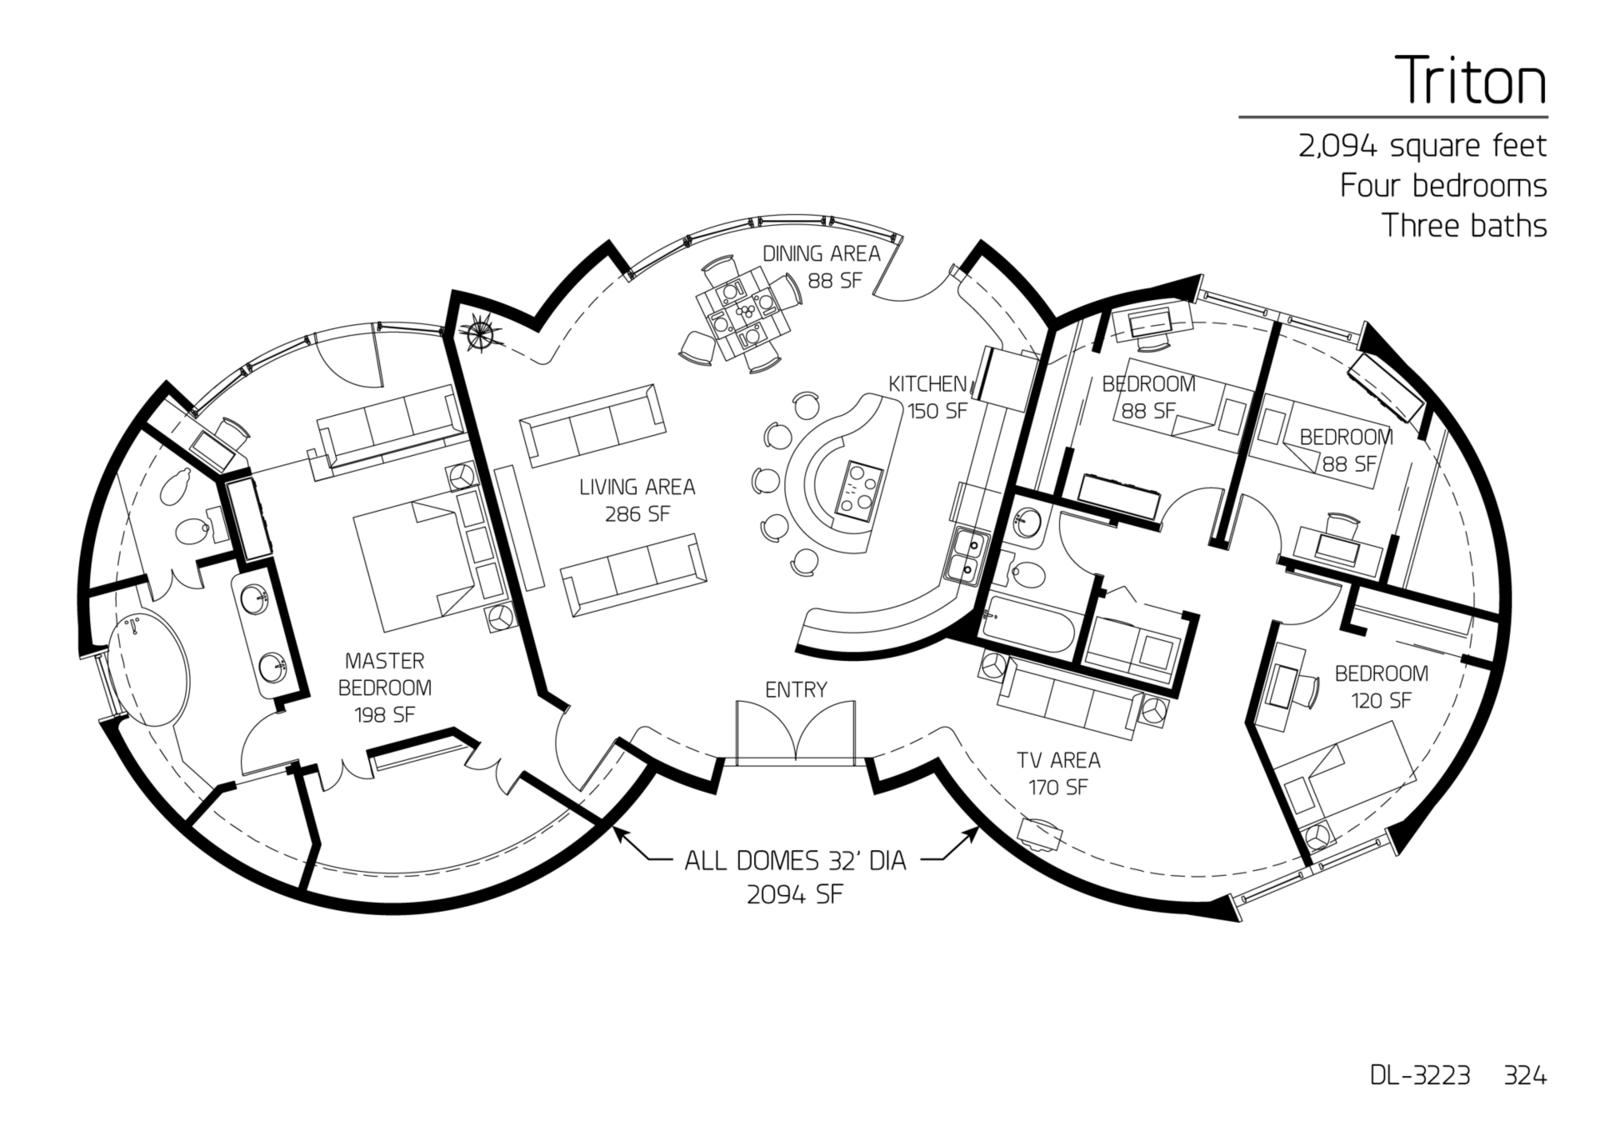 floor plan dl 3223 monolithic dome institute. Black Bedroom Furniture Sets. Home Design Ideas